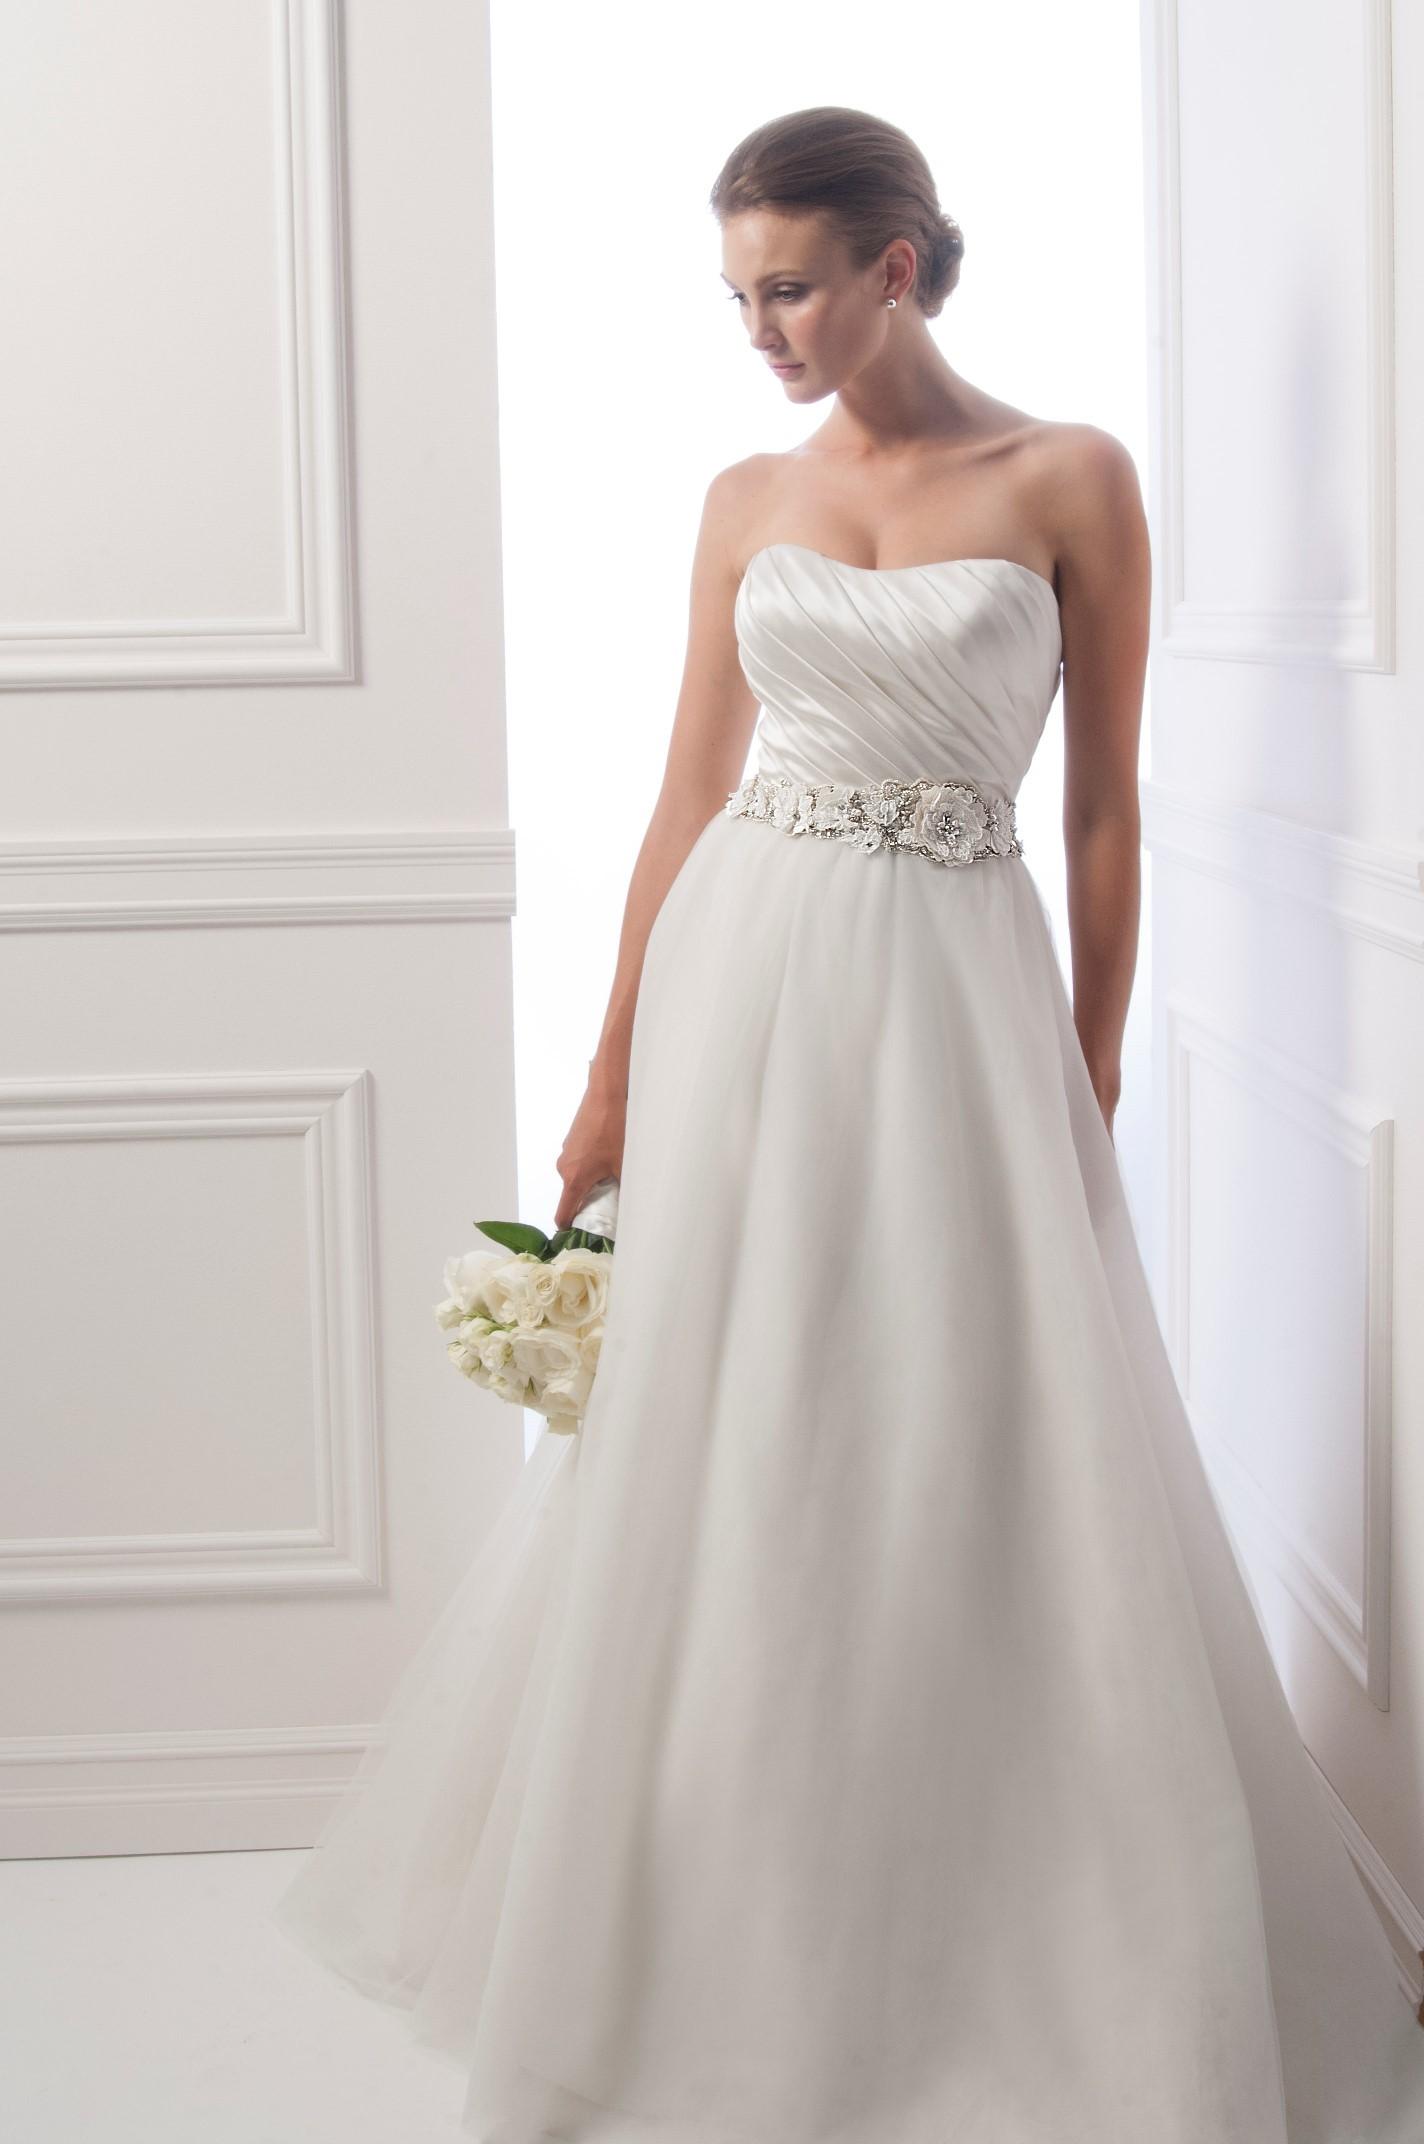 Dress alfred sung fall 2013 bridal 6935 alfredsung bridal alfred sung fall 2013 bridal 6935 ombrellifo Choice Image